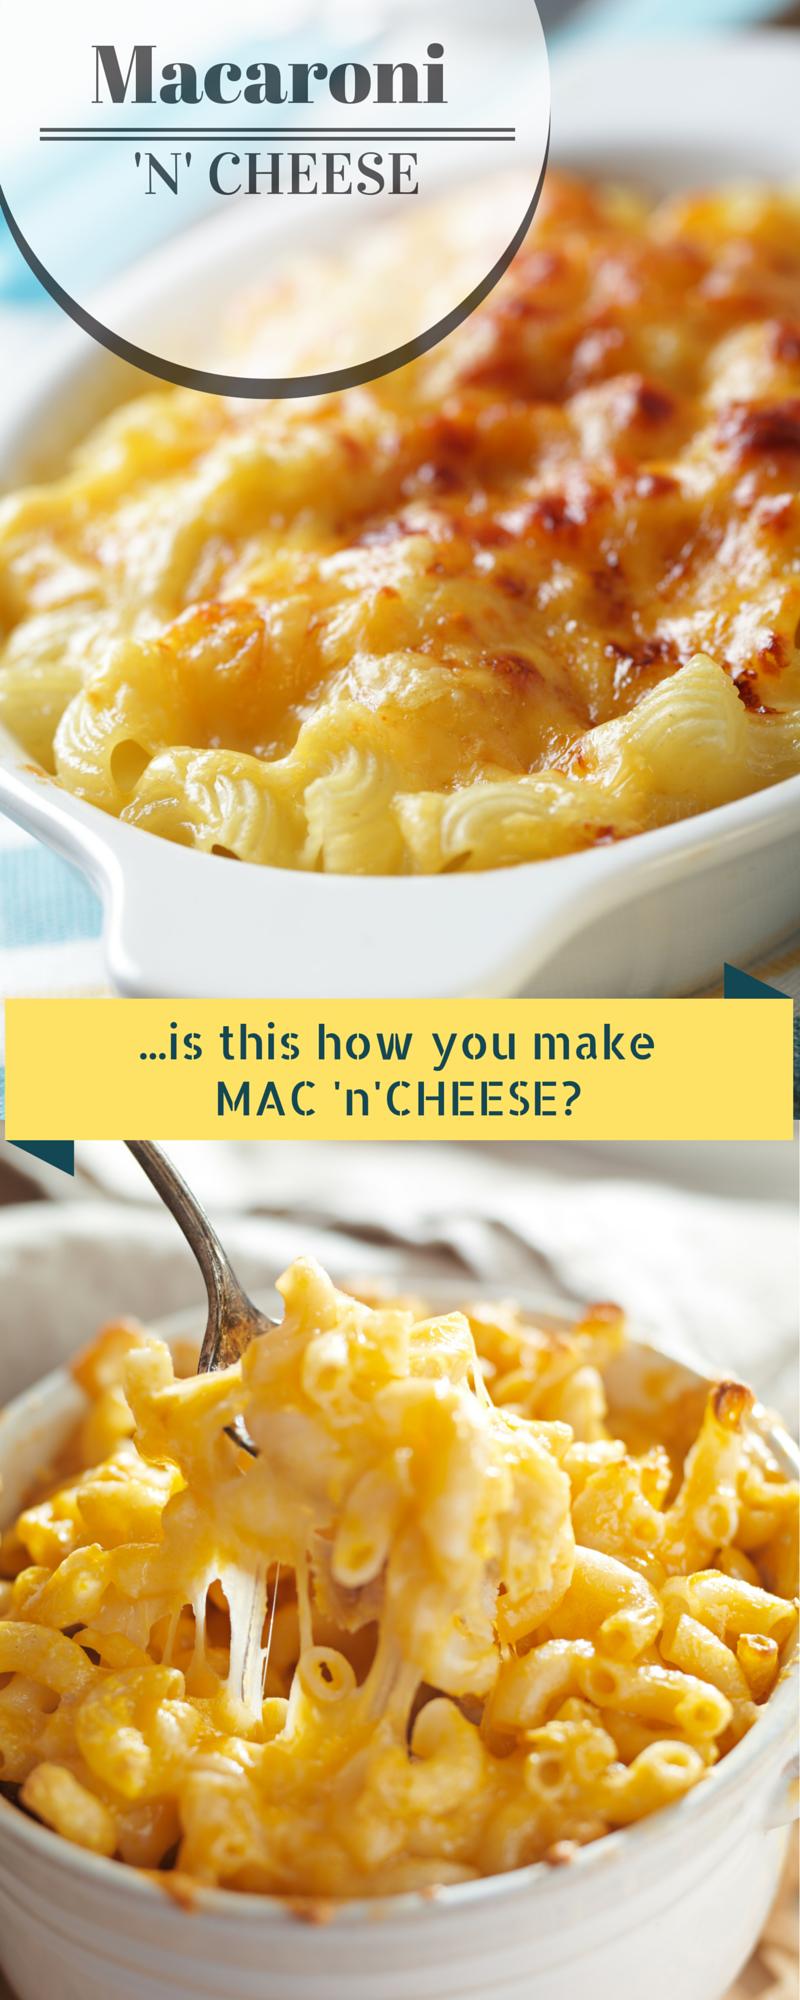 Delicious MAC 'N' CHEESE Recipe